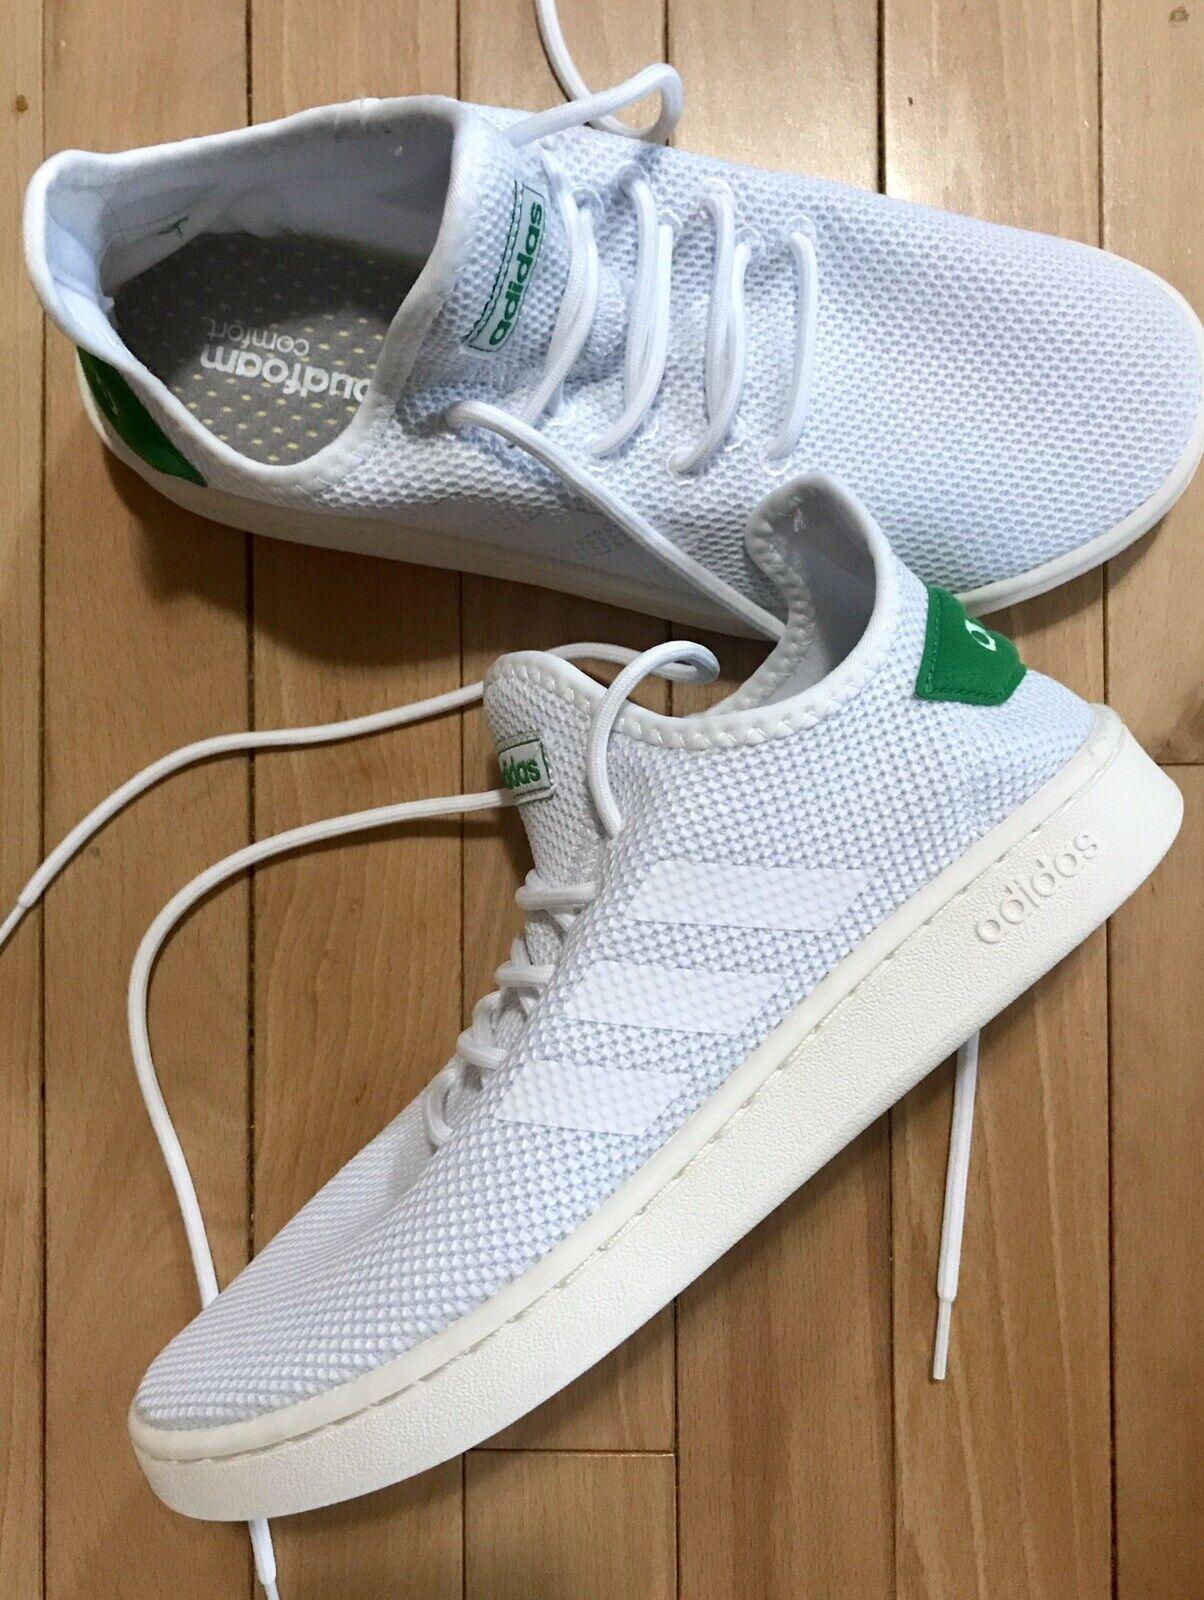 d8b58d957a2 Brand New Adidas Size 8.5 White White White Green shoes f5cc48 ...